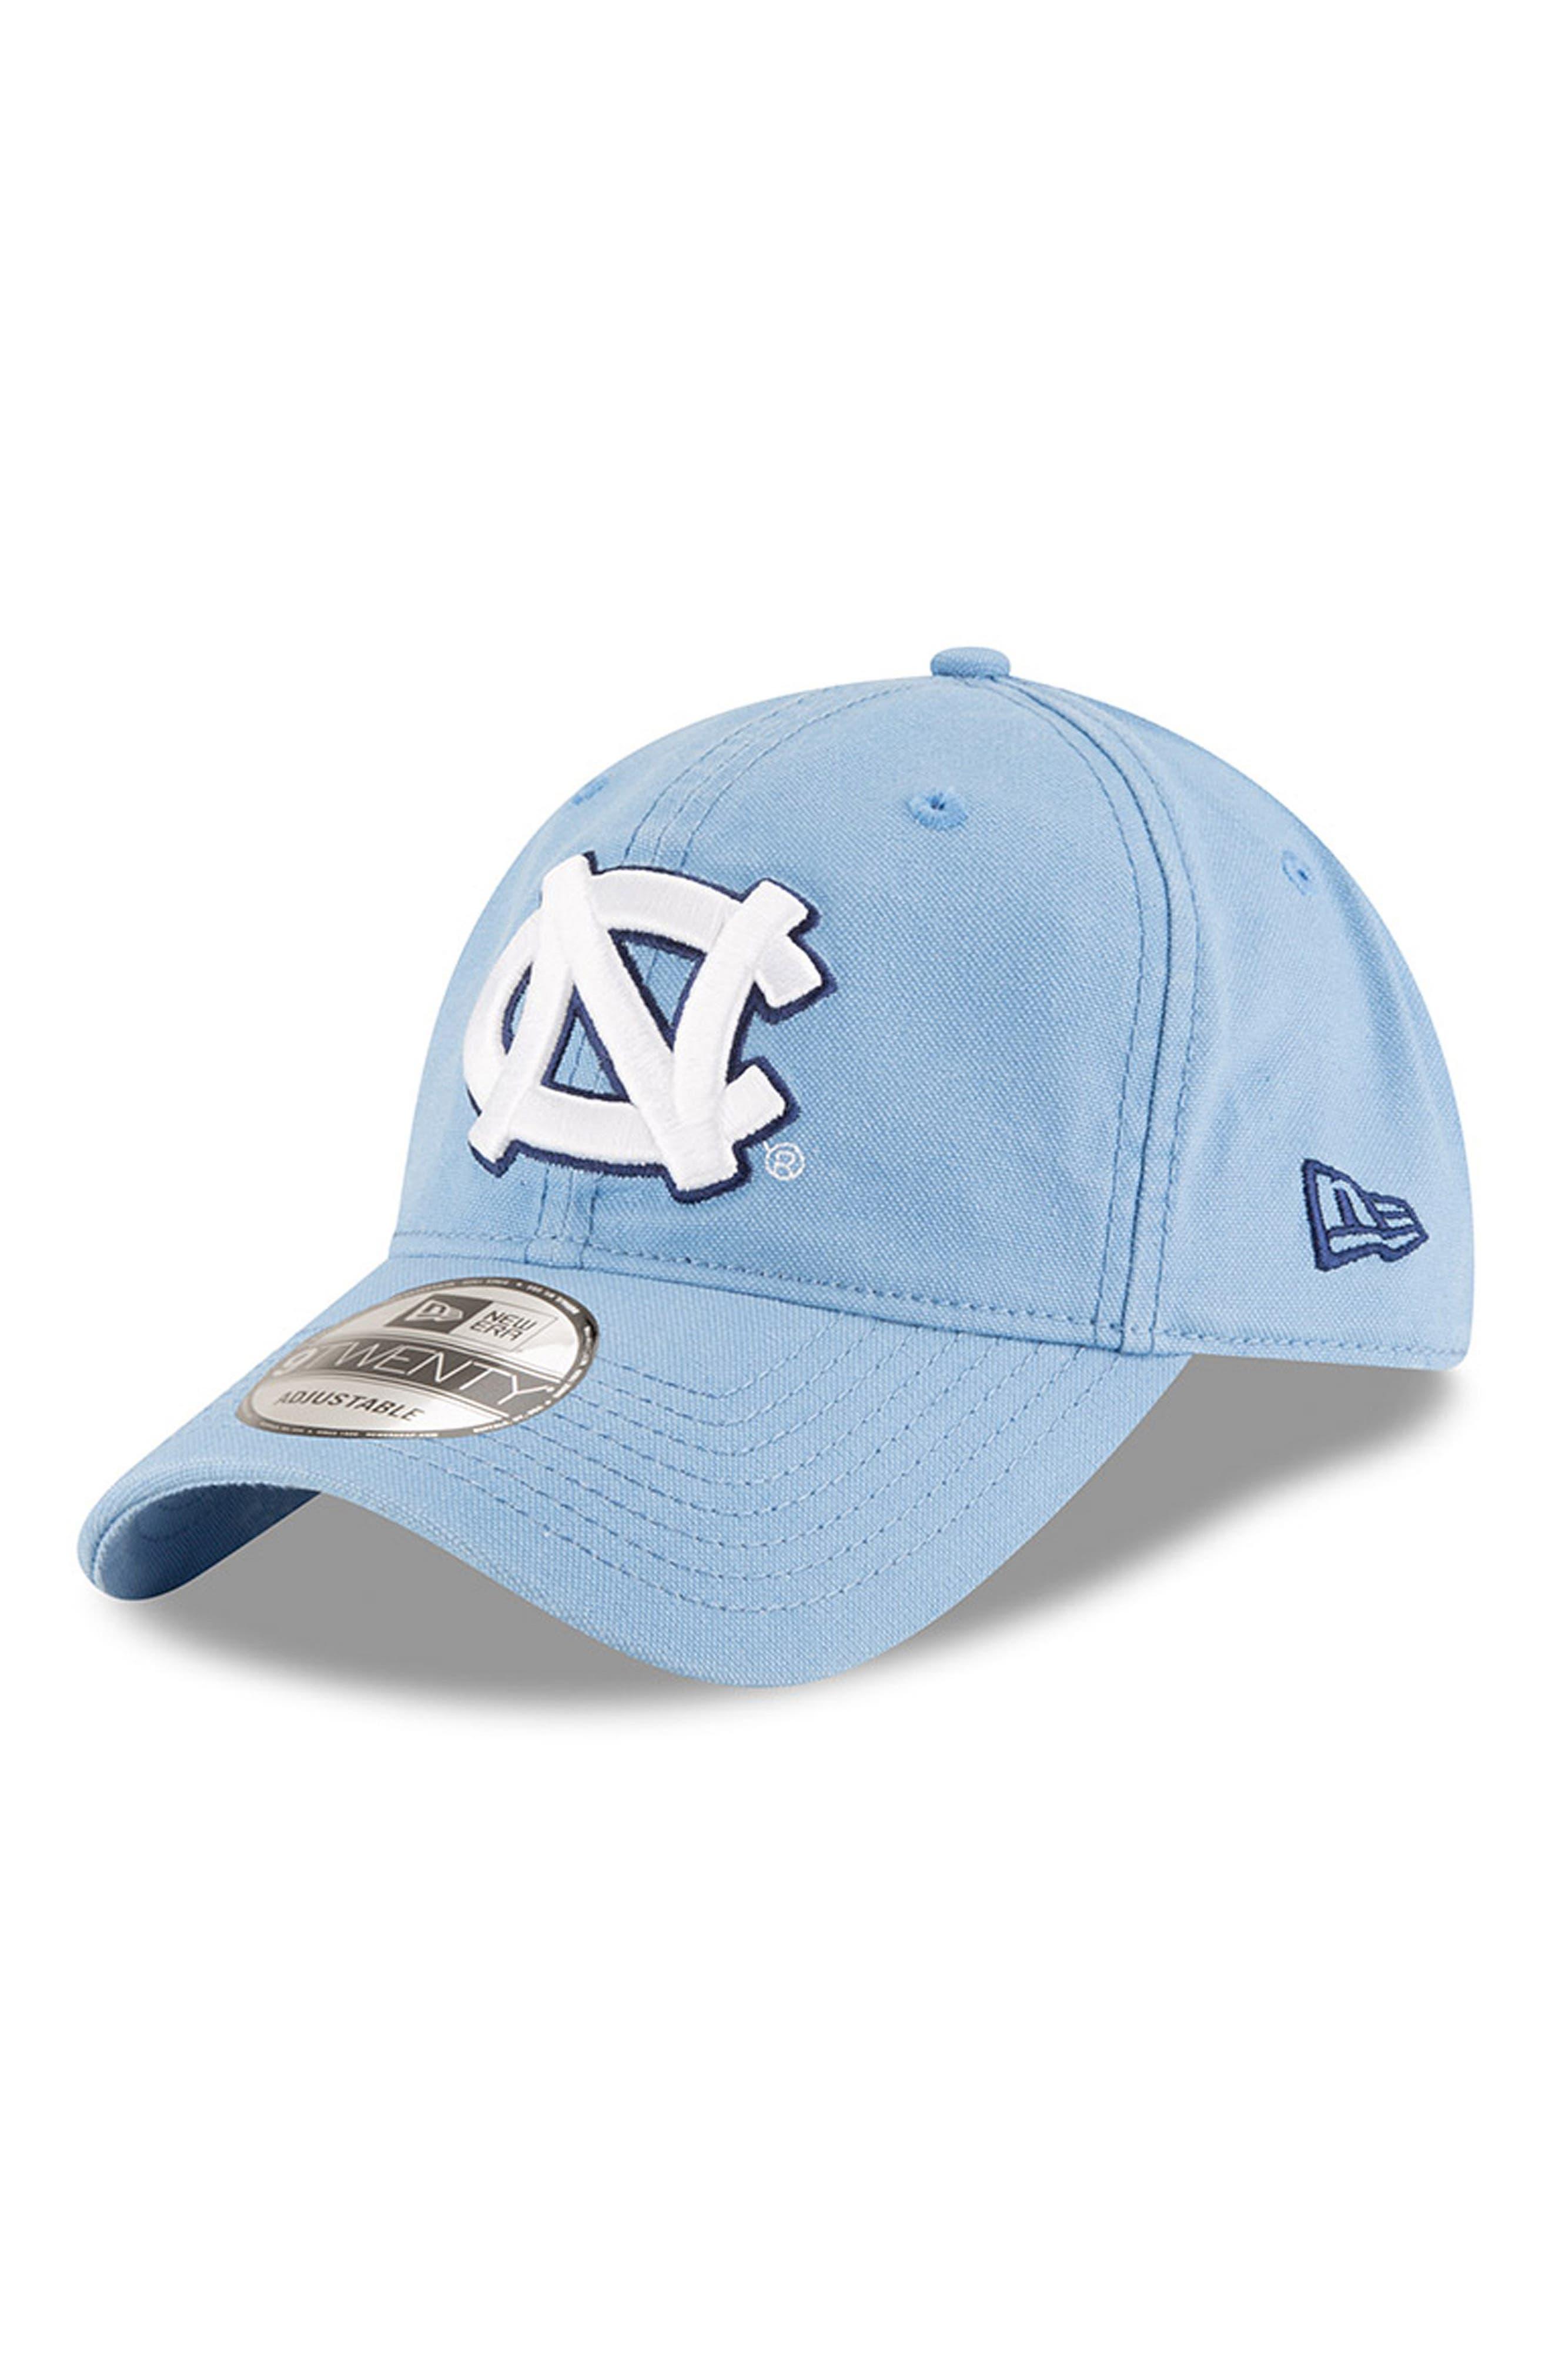 New Era Collegiate Core Classic - North Carolina Tar Heels Baseball Cap,                         Main,                         color, North Carolina Tar Heels